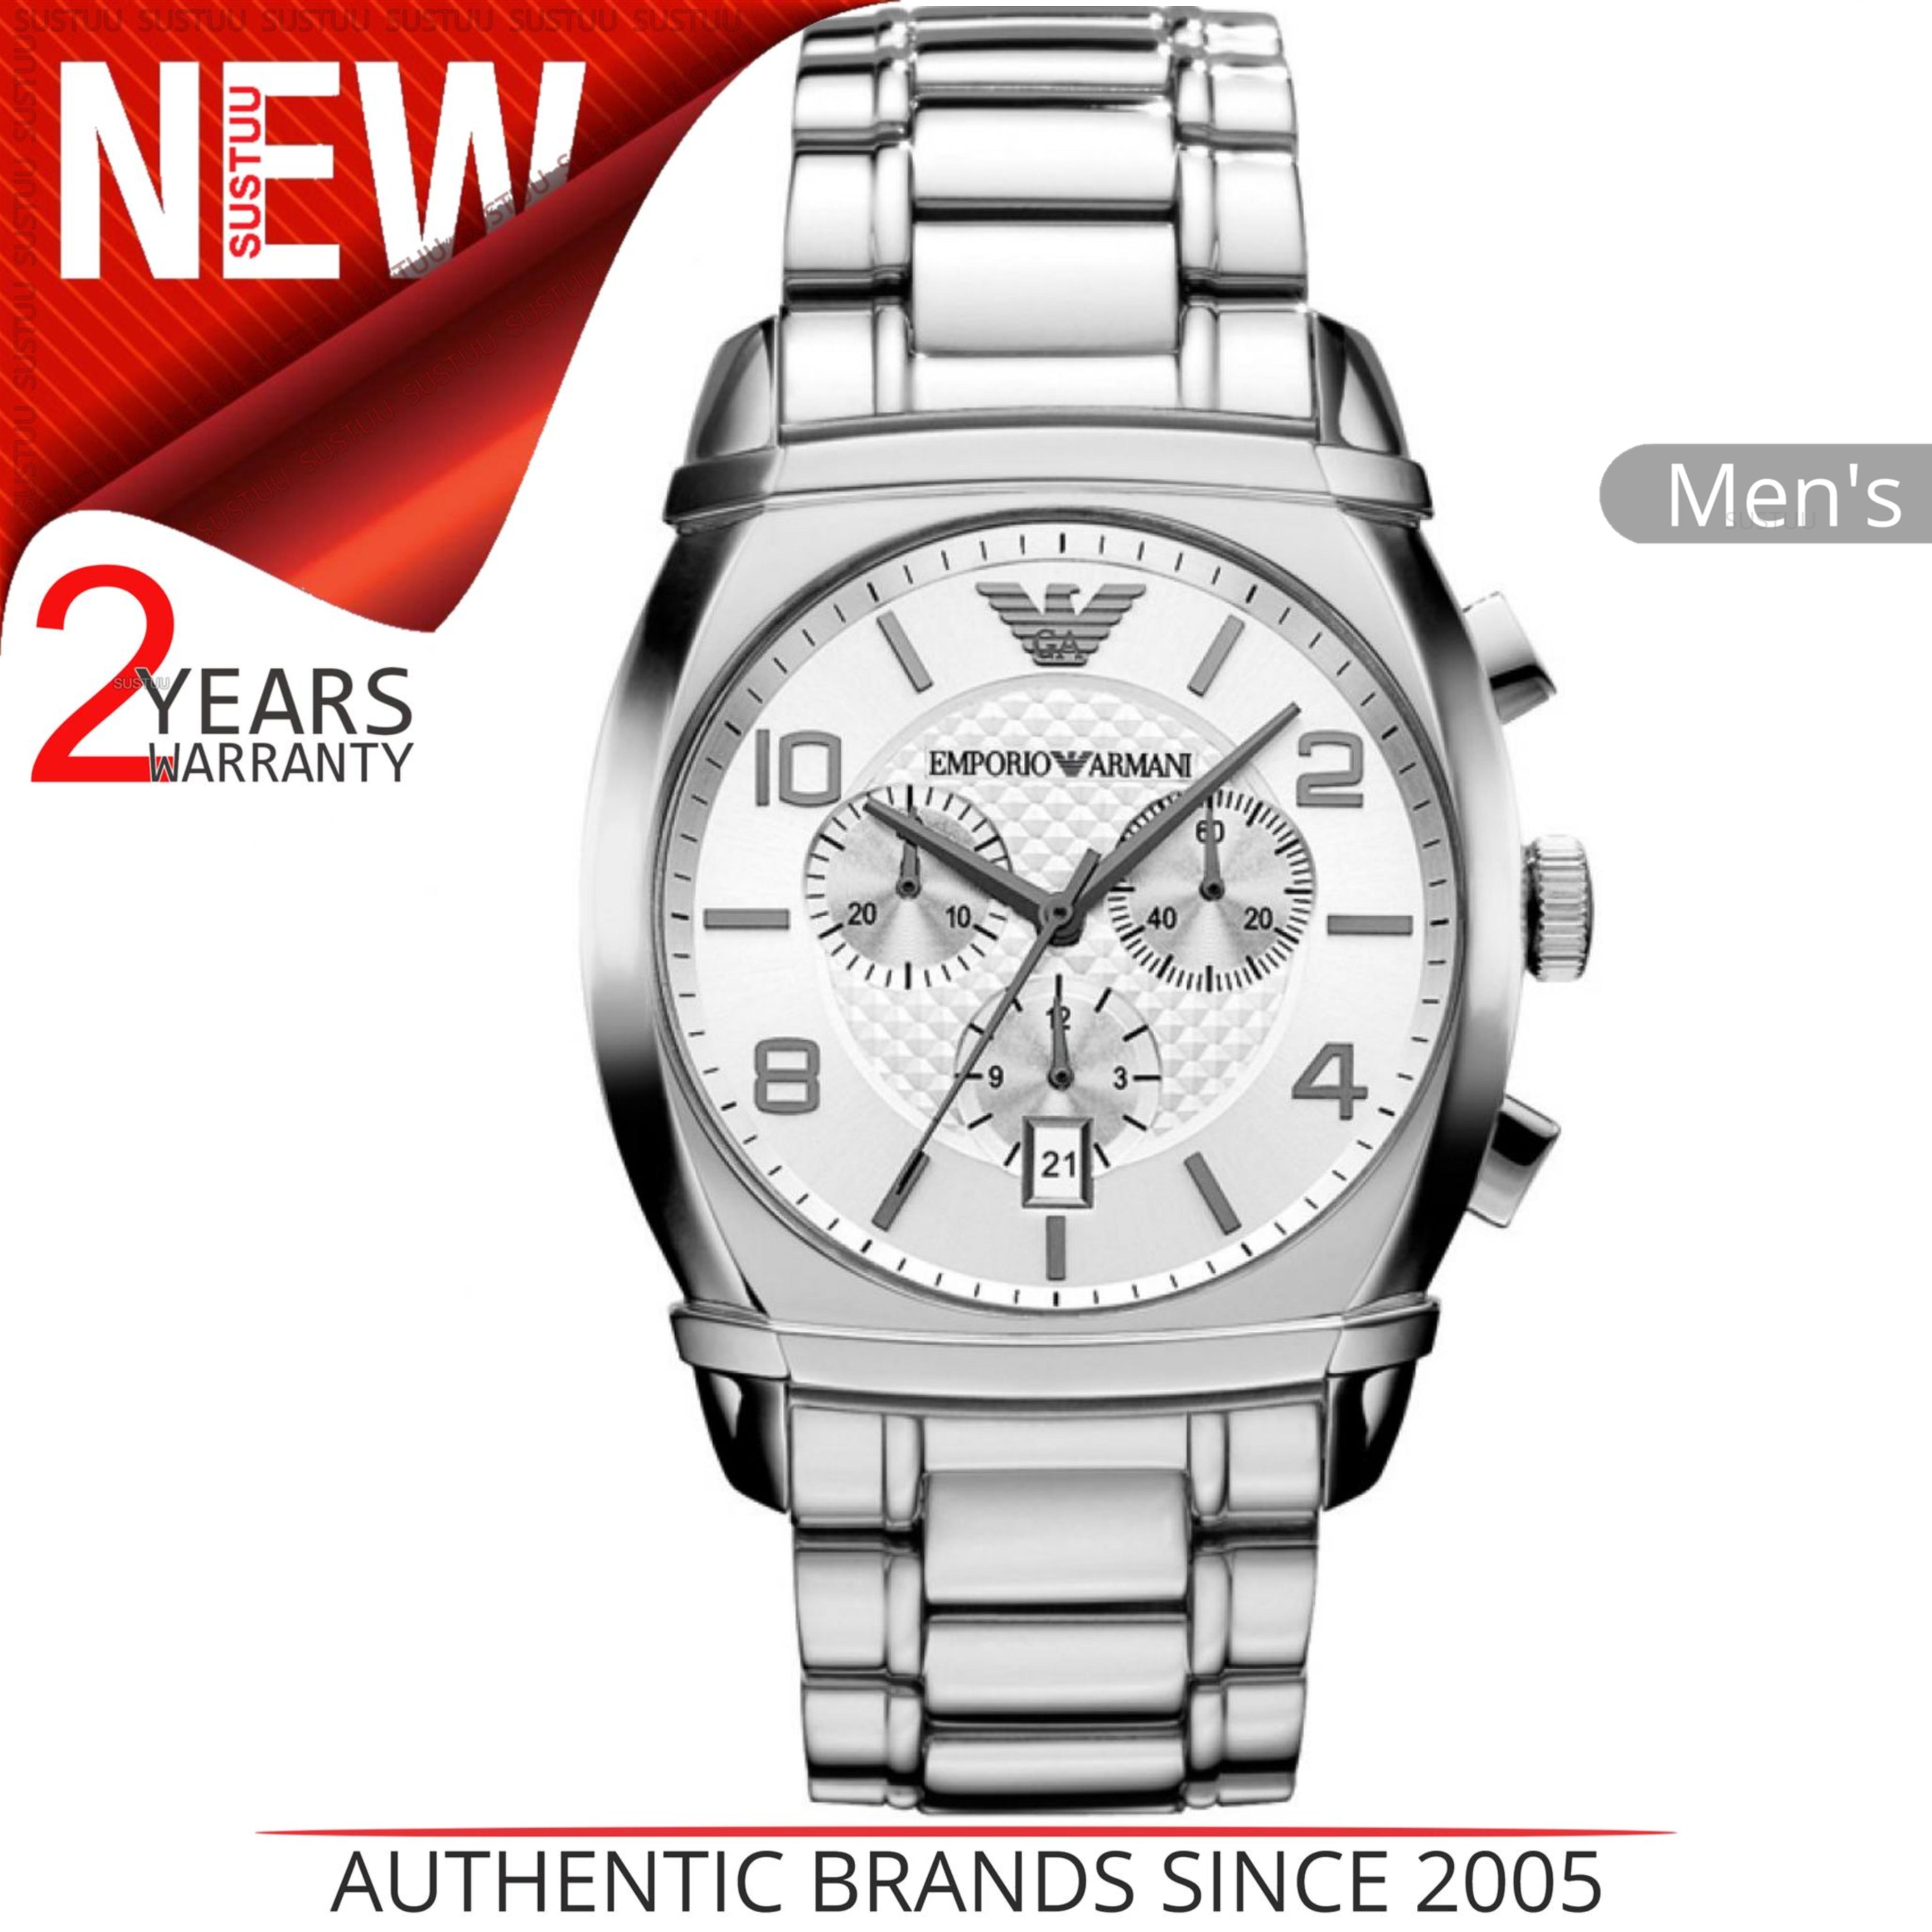 SENTINEL Watch│Round Cronografo Dial│Stainless Strap│AR0350 Emporio Armani  classico maschile c7f921680d